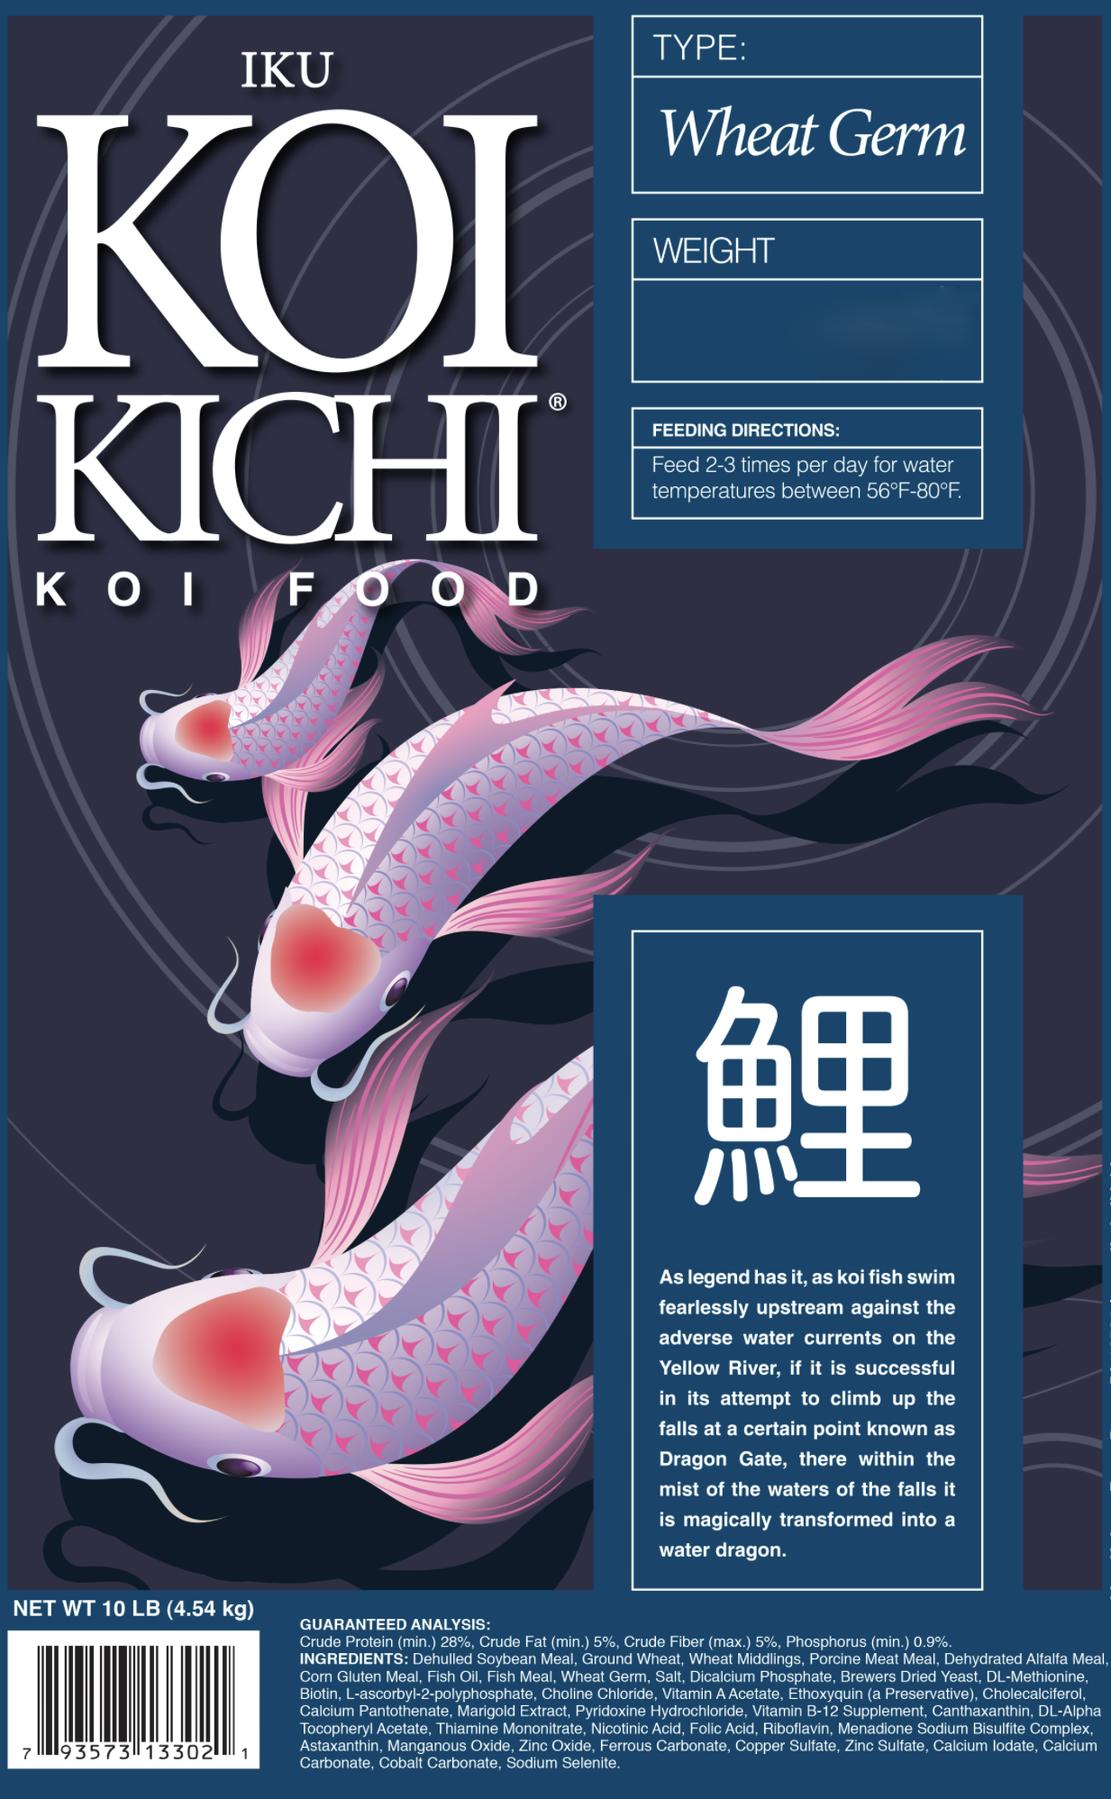 Iku Koi Kichi Wheat Germ Koi Fish Food - 2 lbs.